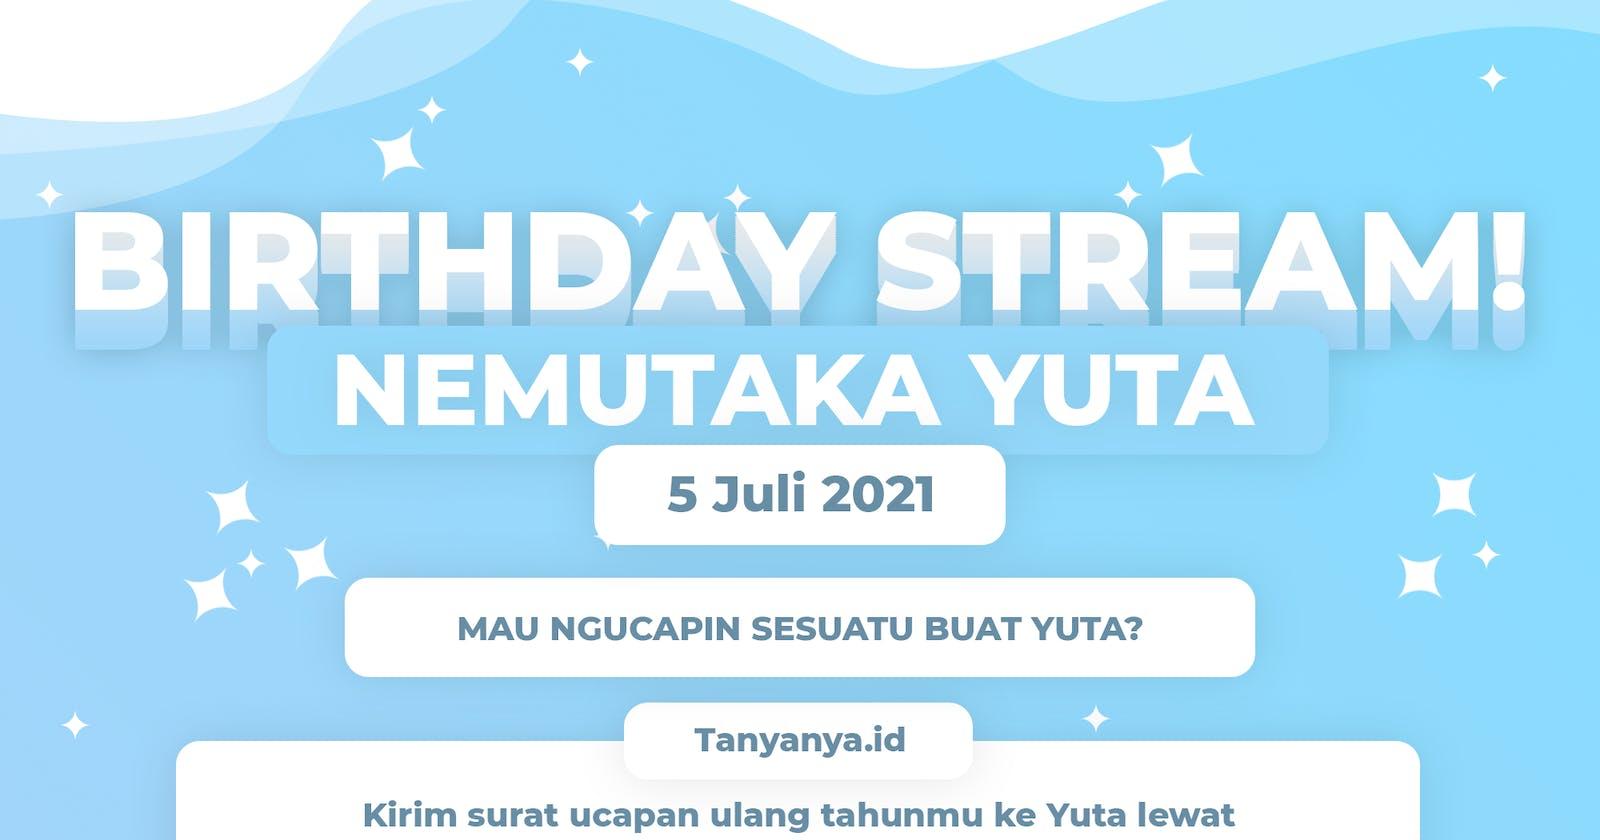 Undangan Ulang Tahun Yuta!